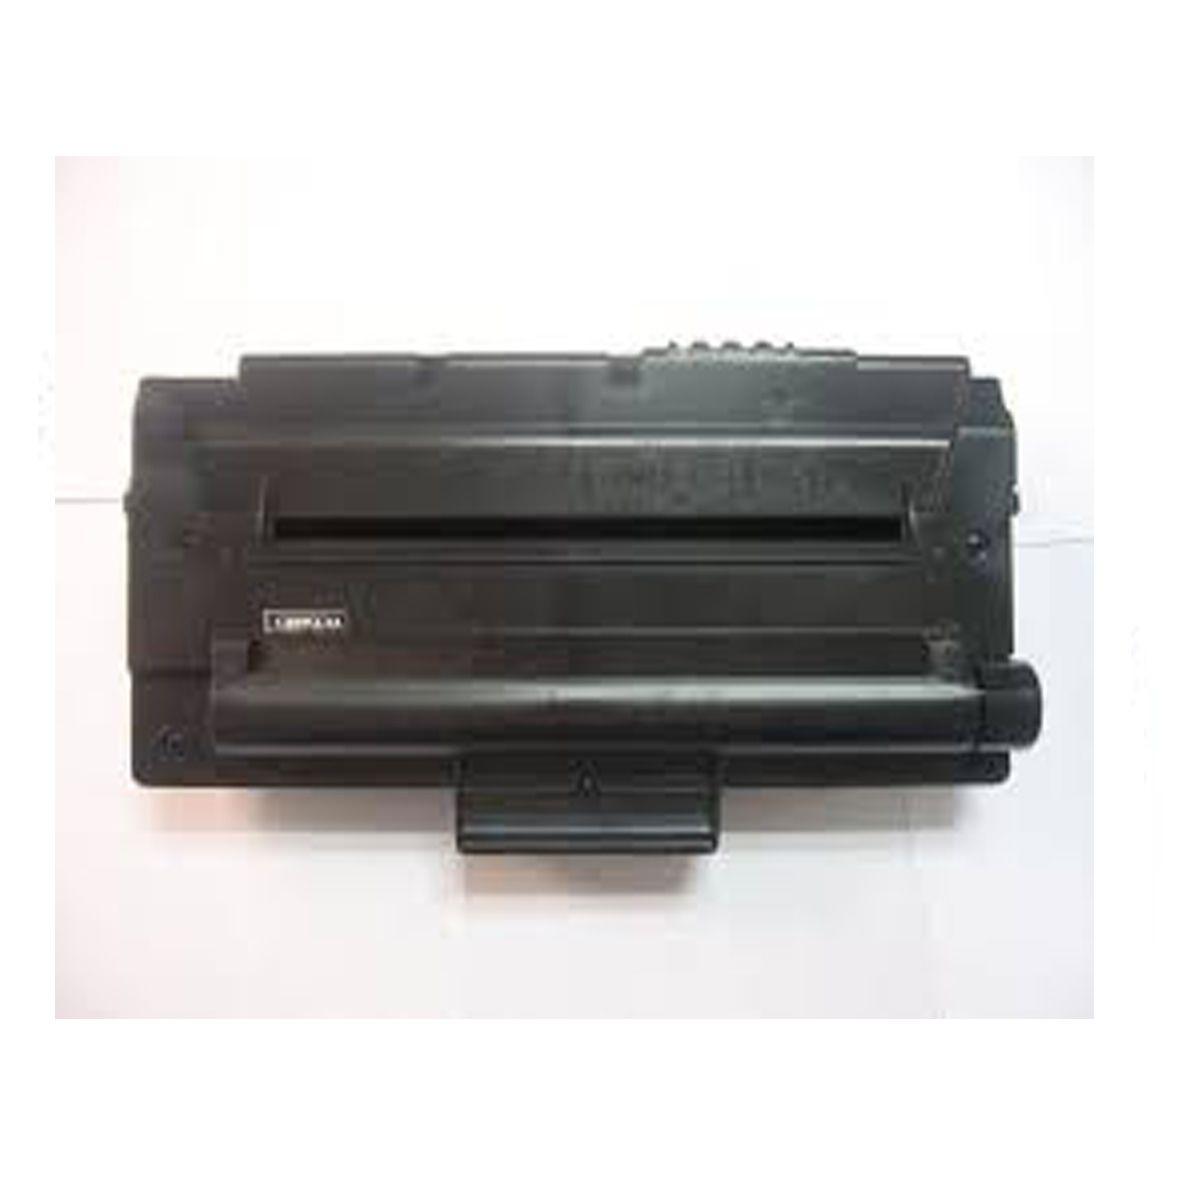 Toner Samsung D109S D109 109 - SCX-4300 SCX 4300